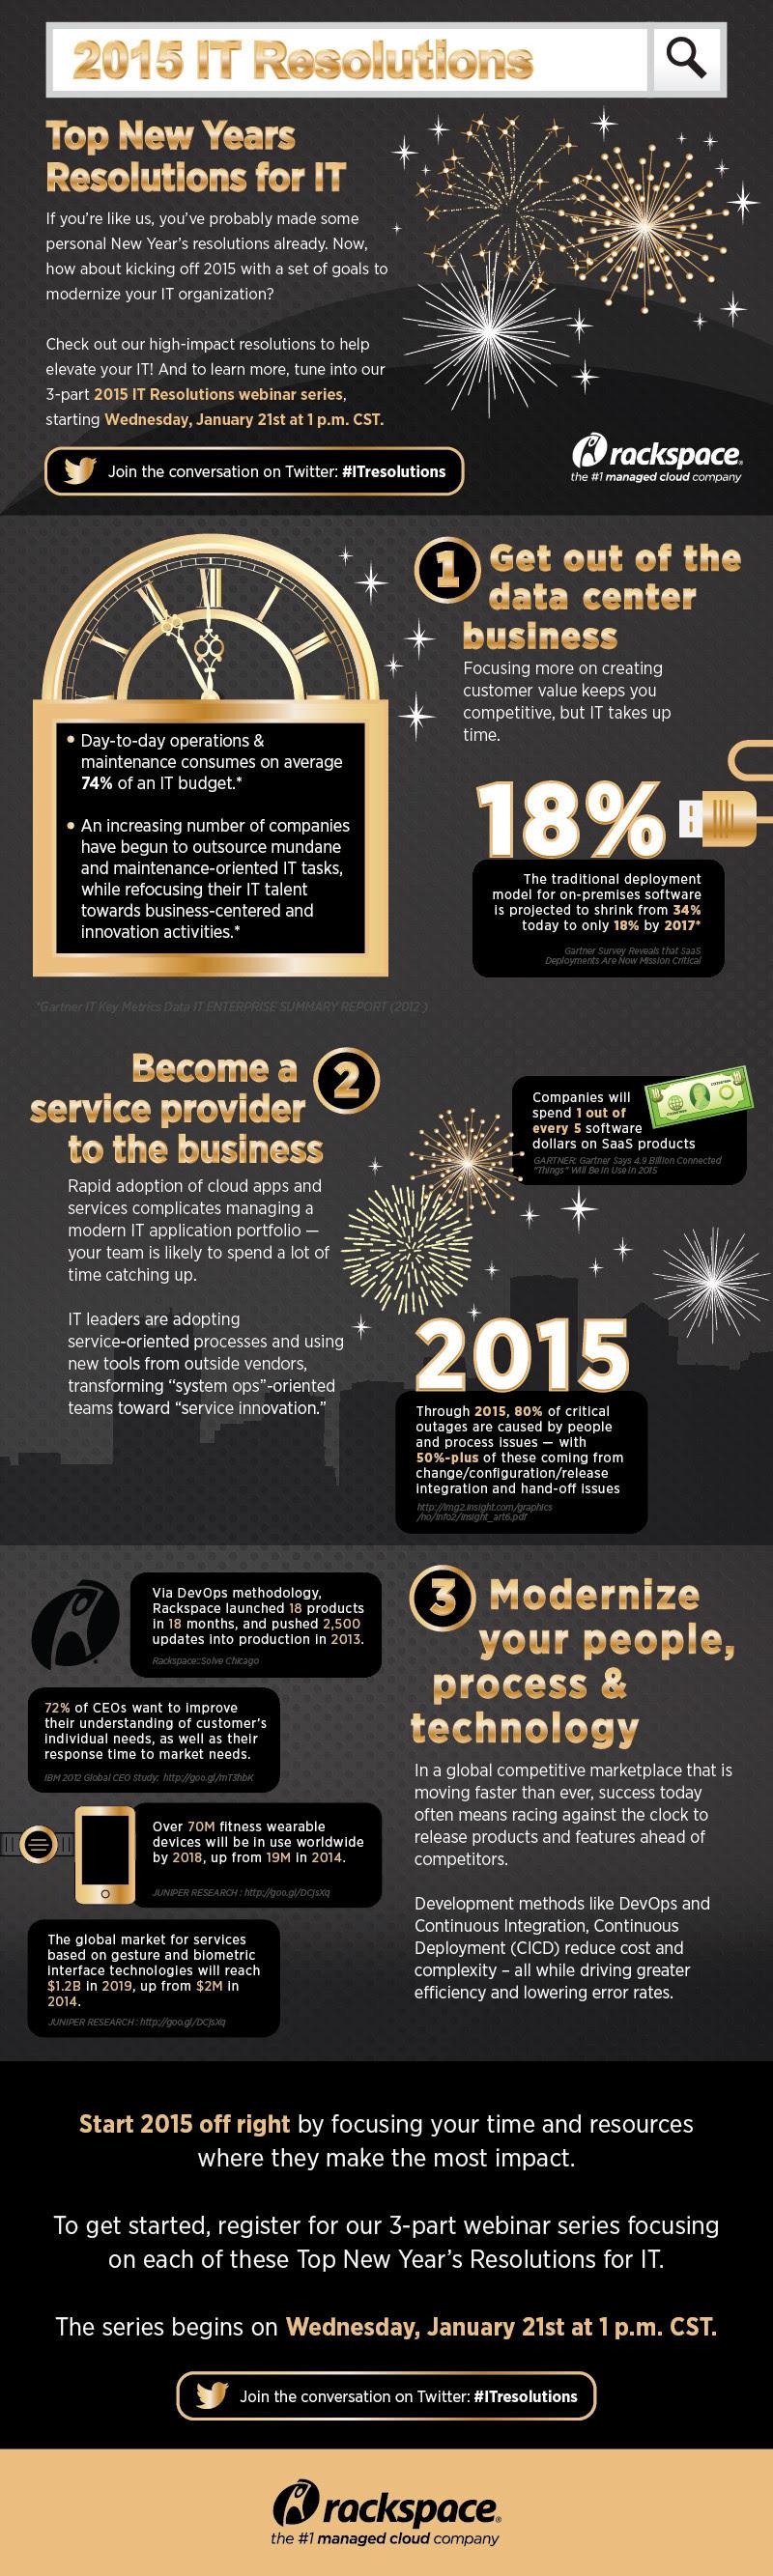 2015 IT Resolutions